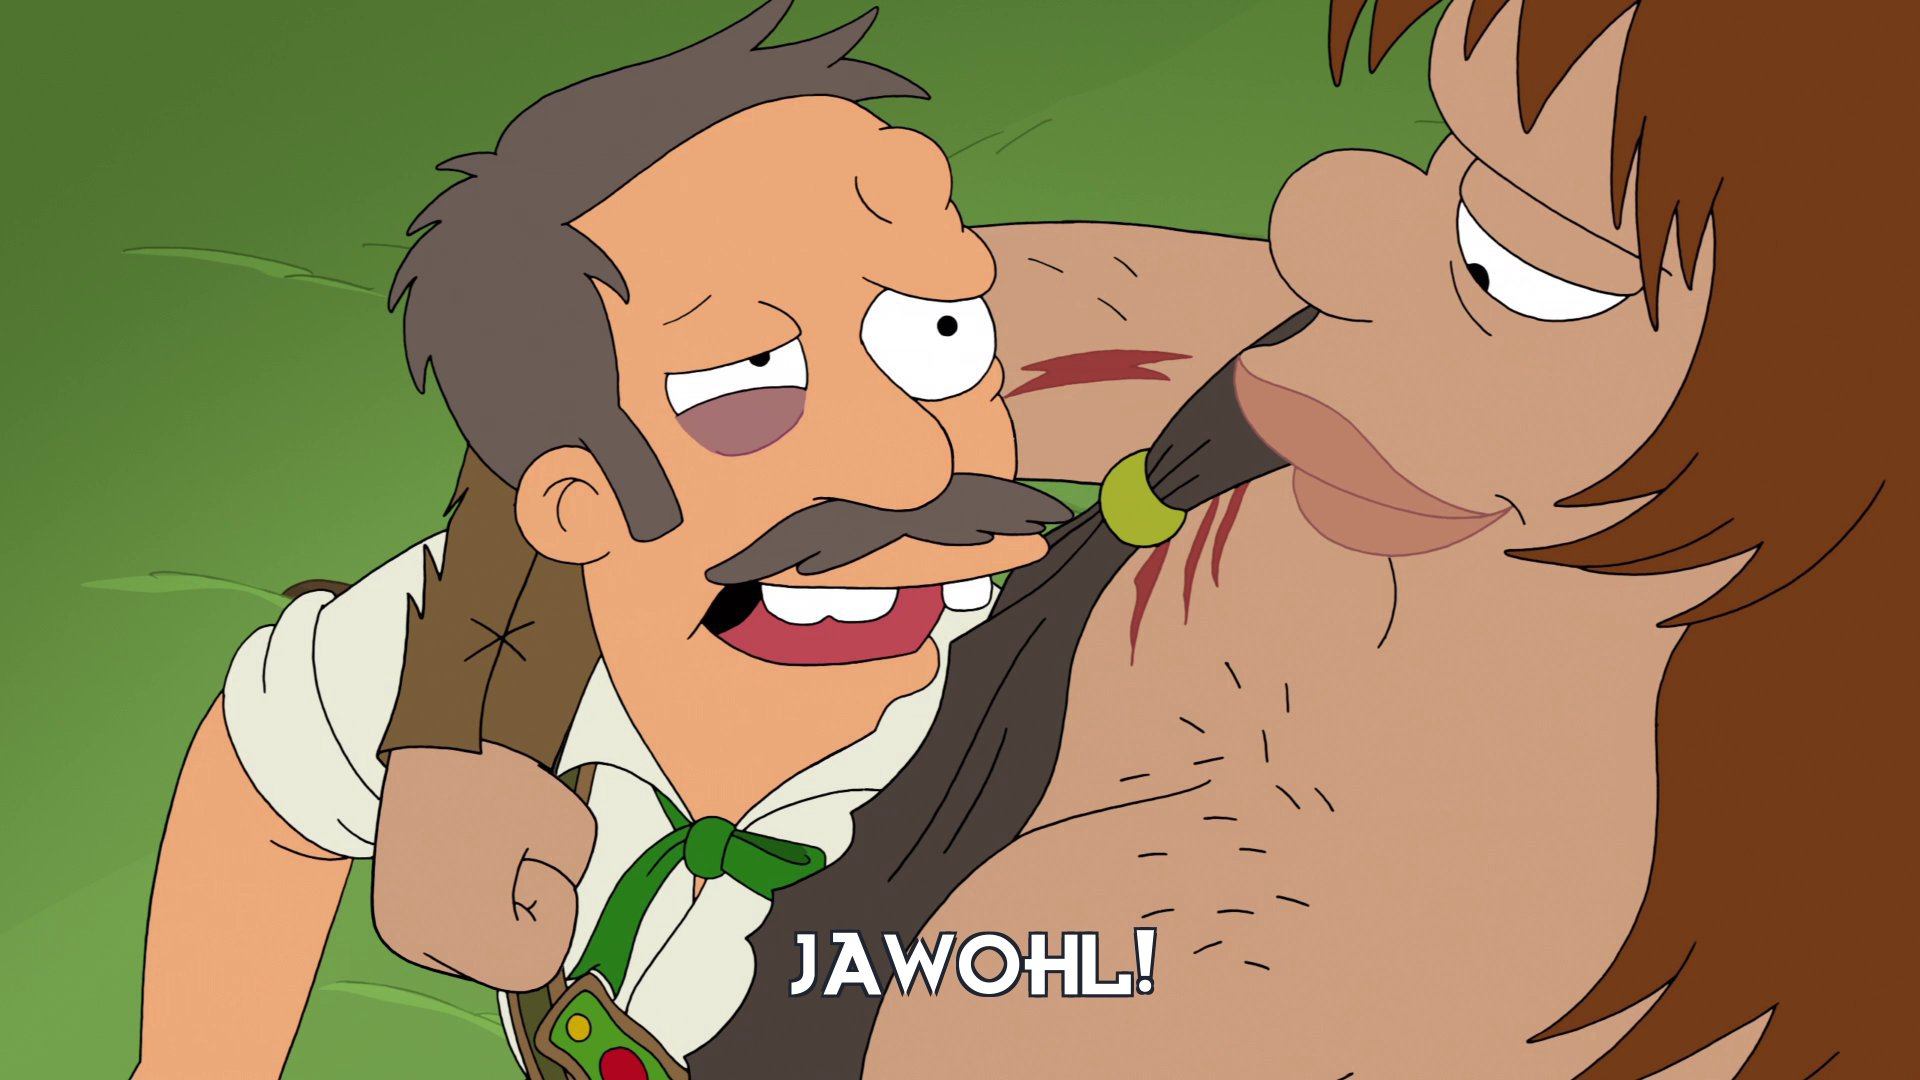 Man: Jawohl!